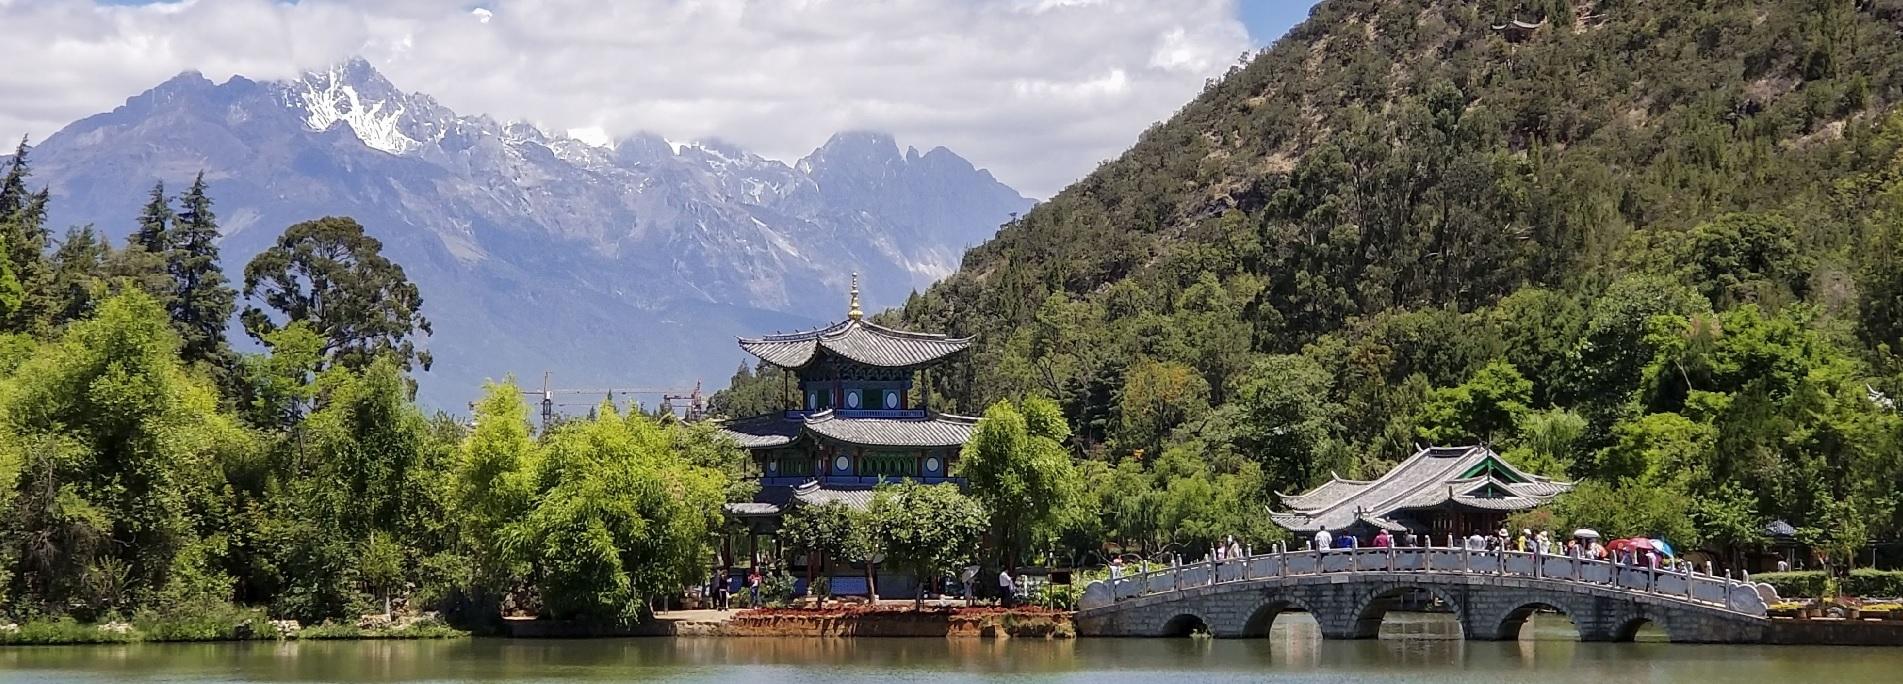 Black Dragon Pool park in Lijiang